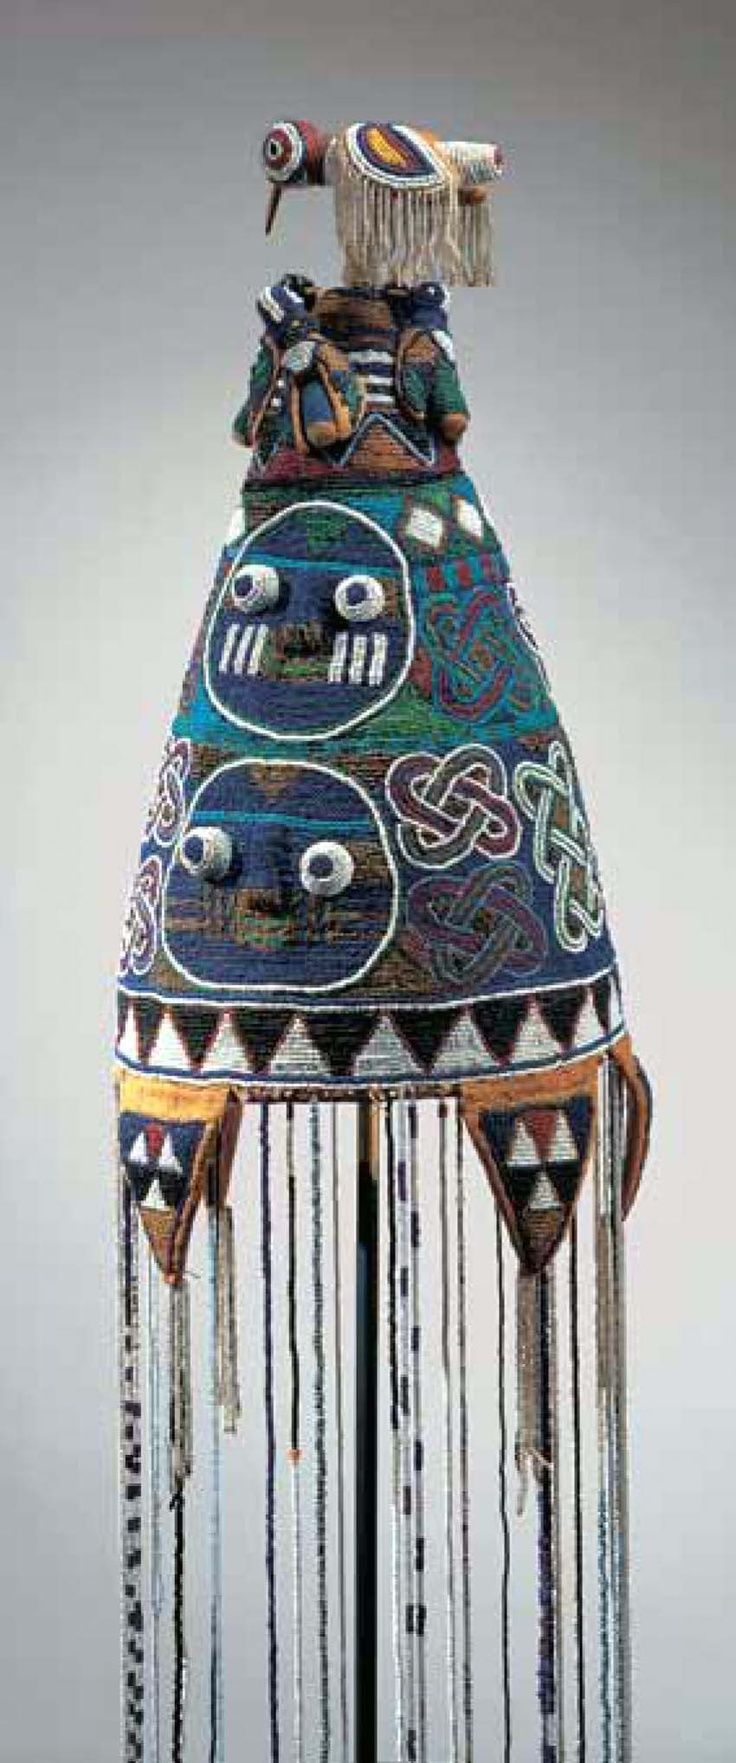 Yoruba Ade Oba (Adenla) (King's Beaded Crown), Nigeria http://www.imodara.com/post/99254829824/nigeria-yoruba-ade-oba-kings-crown-adenla